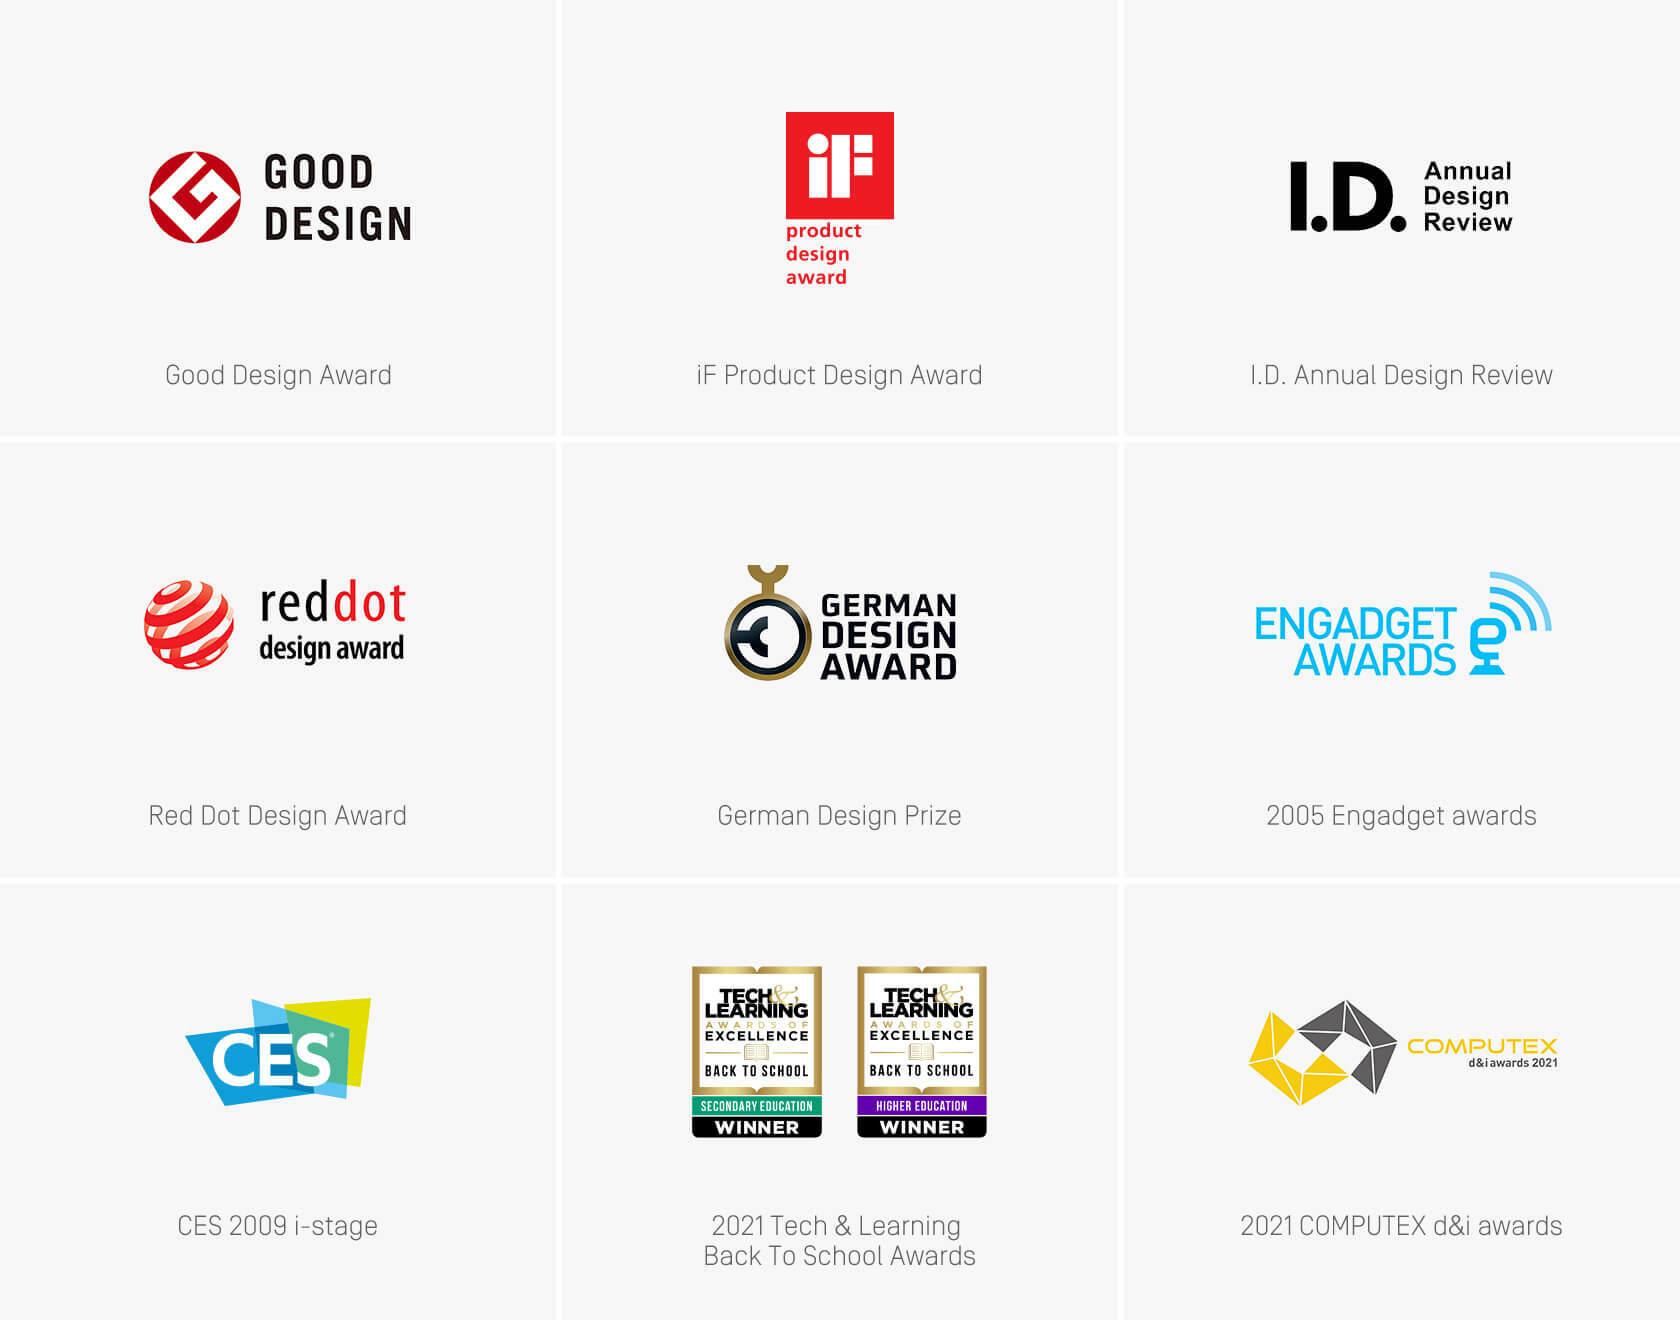 Good Design Award、iF Product Design Award、I.D. Annual Design Review、Red Dot Design Award、German Design Prize、2005 Engadget awards、CES 2009 i-stage、2021 Tech & Learning Back To School Awards、2021 COMPUTEX d&i awards